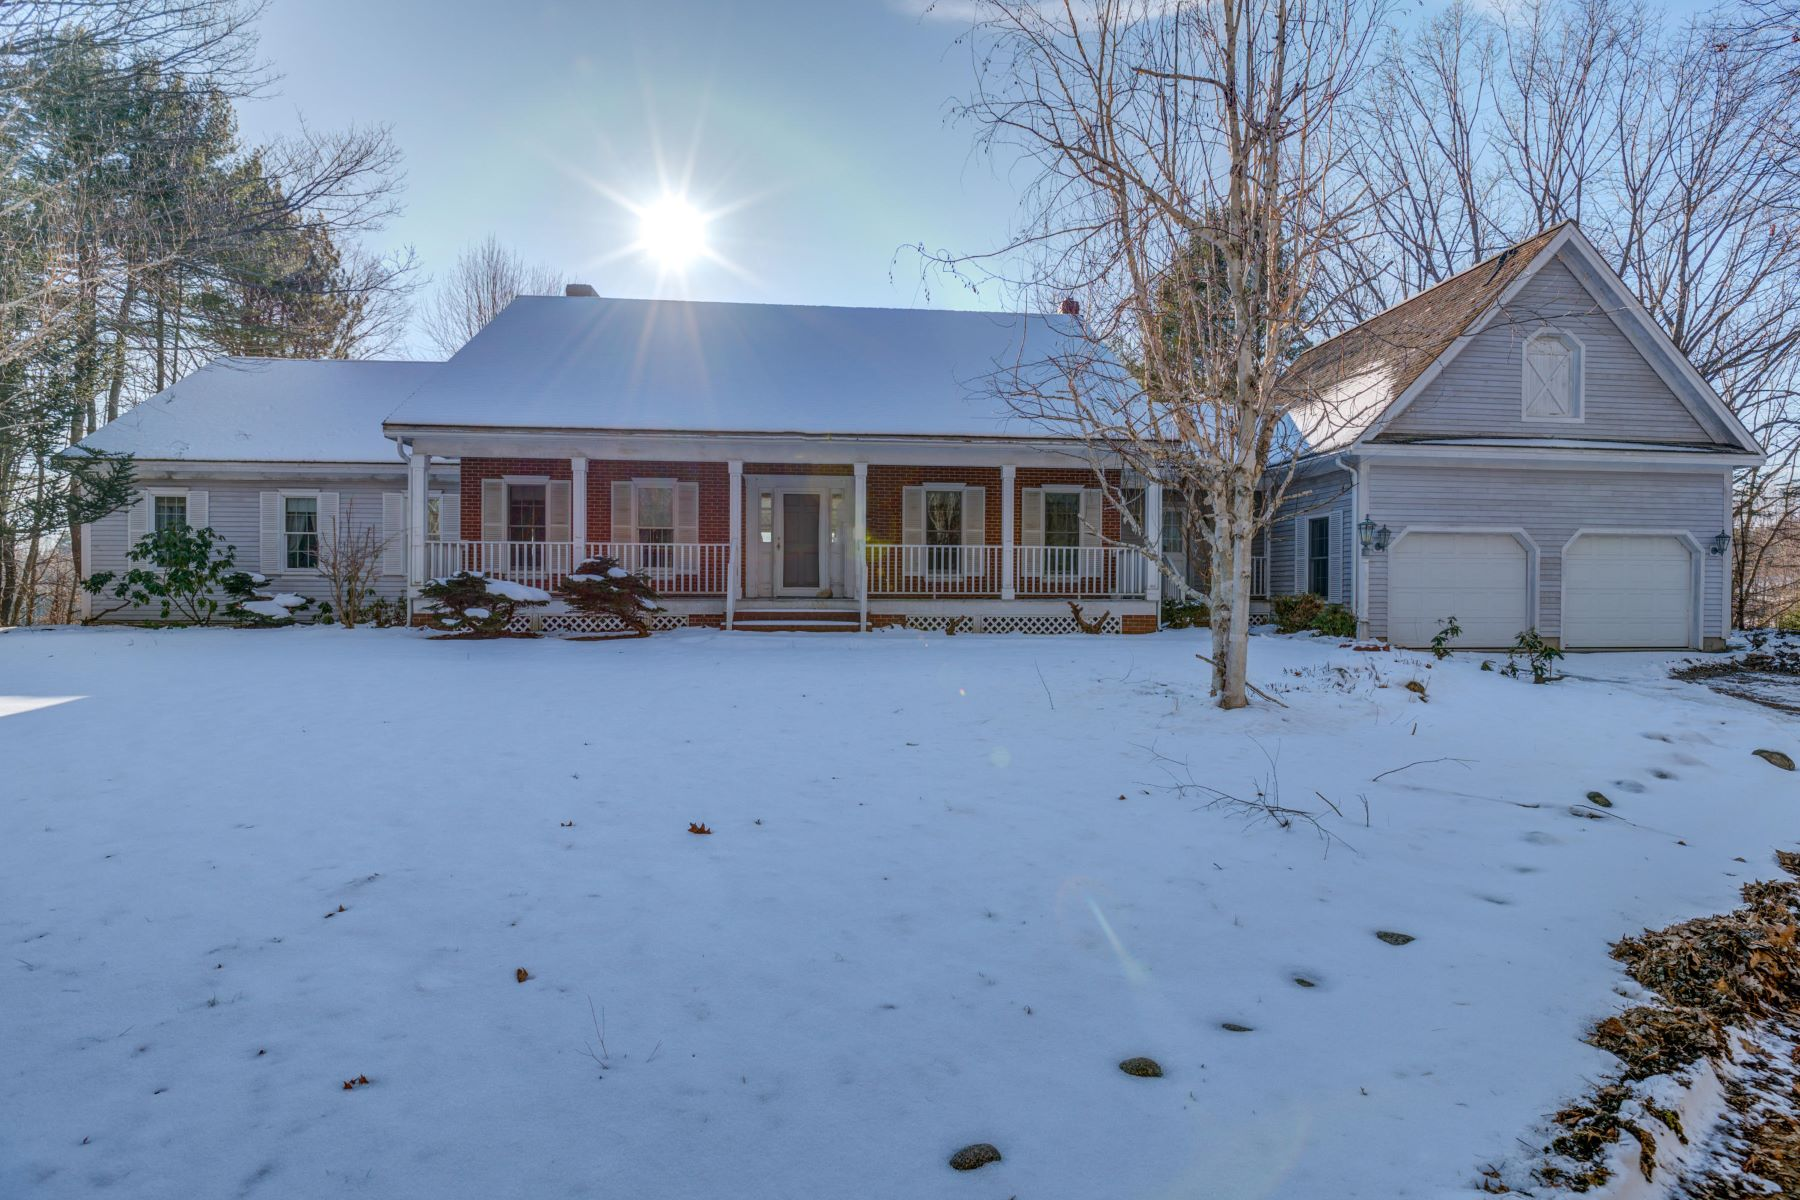 Single Family Homes for Sale at 11 Abenaki Way Kennebunkport, Maine 04046 United States